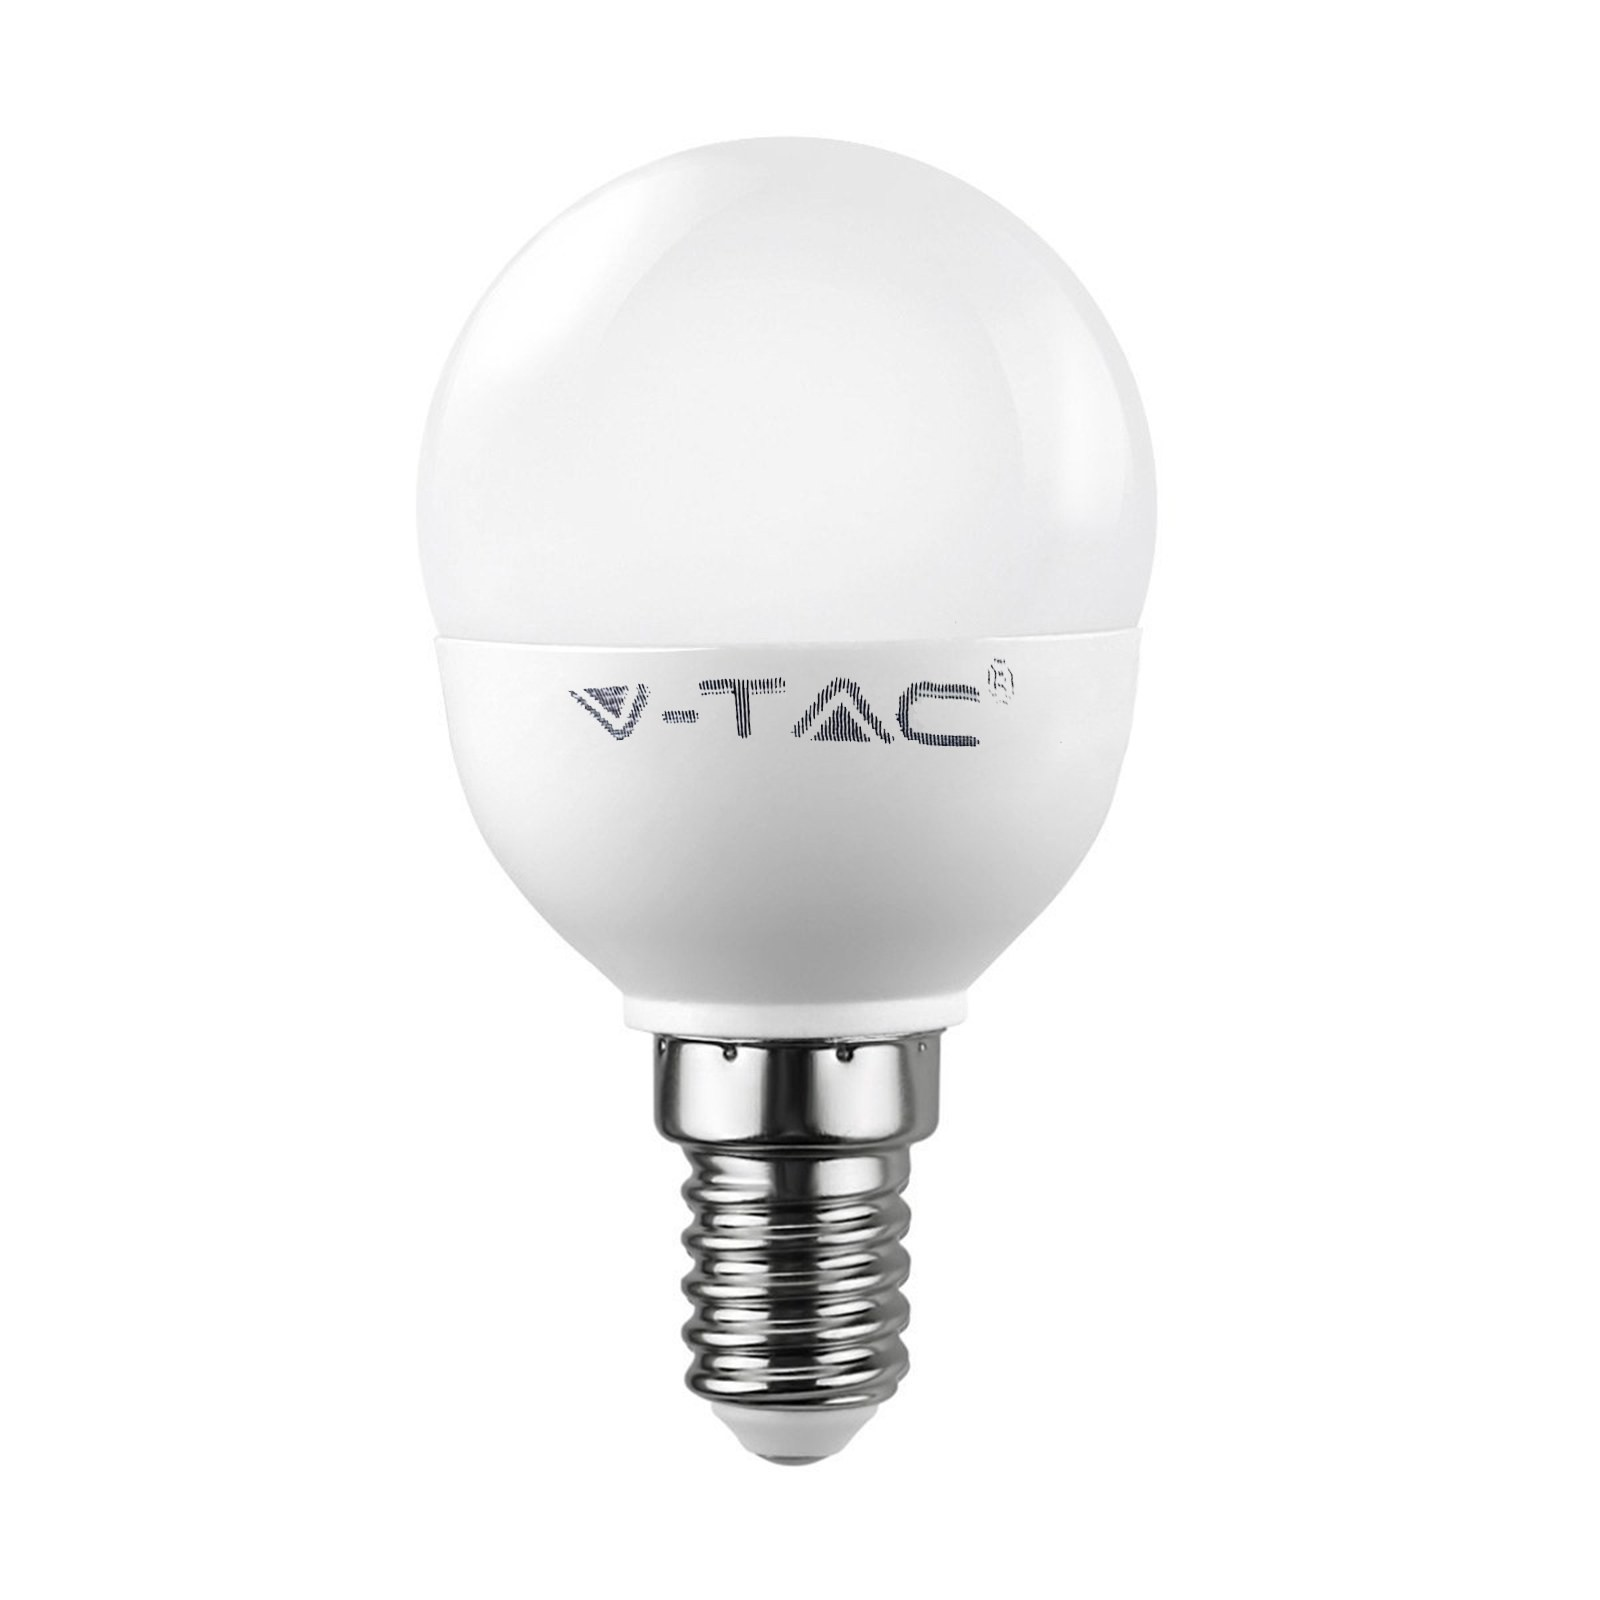 lampadina luce naturale : ... Lampadina E14 LED SMD V-TAC VT-1880 Miniglobo P45 Luce Naturale 6 Watt